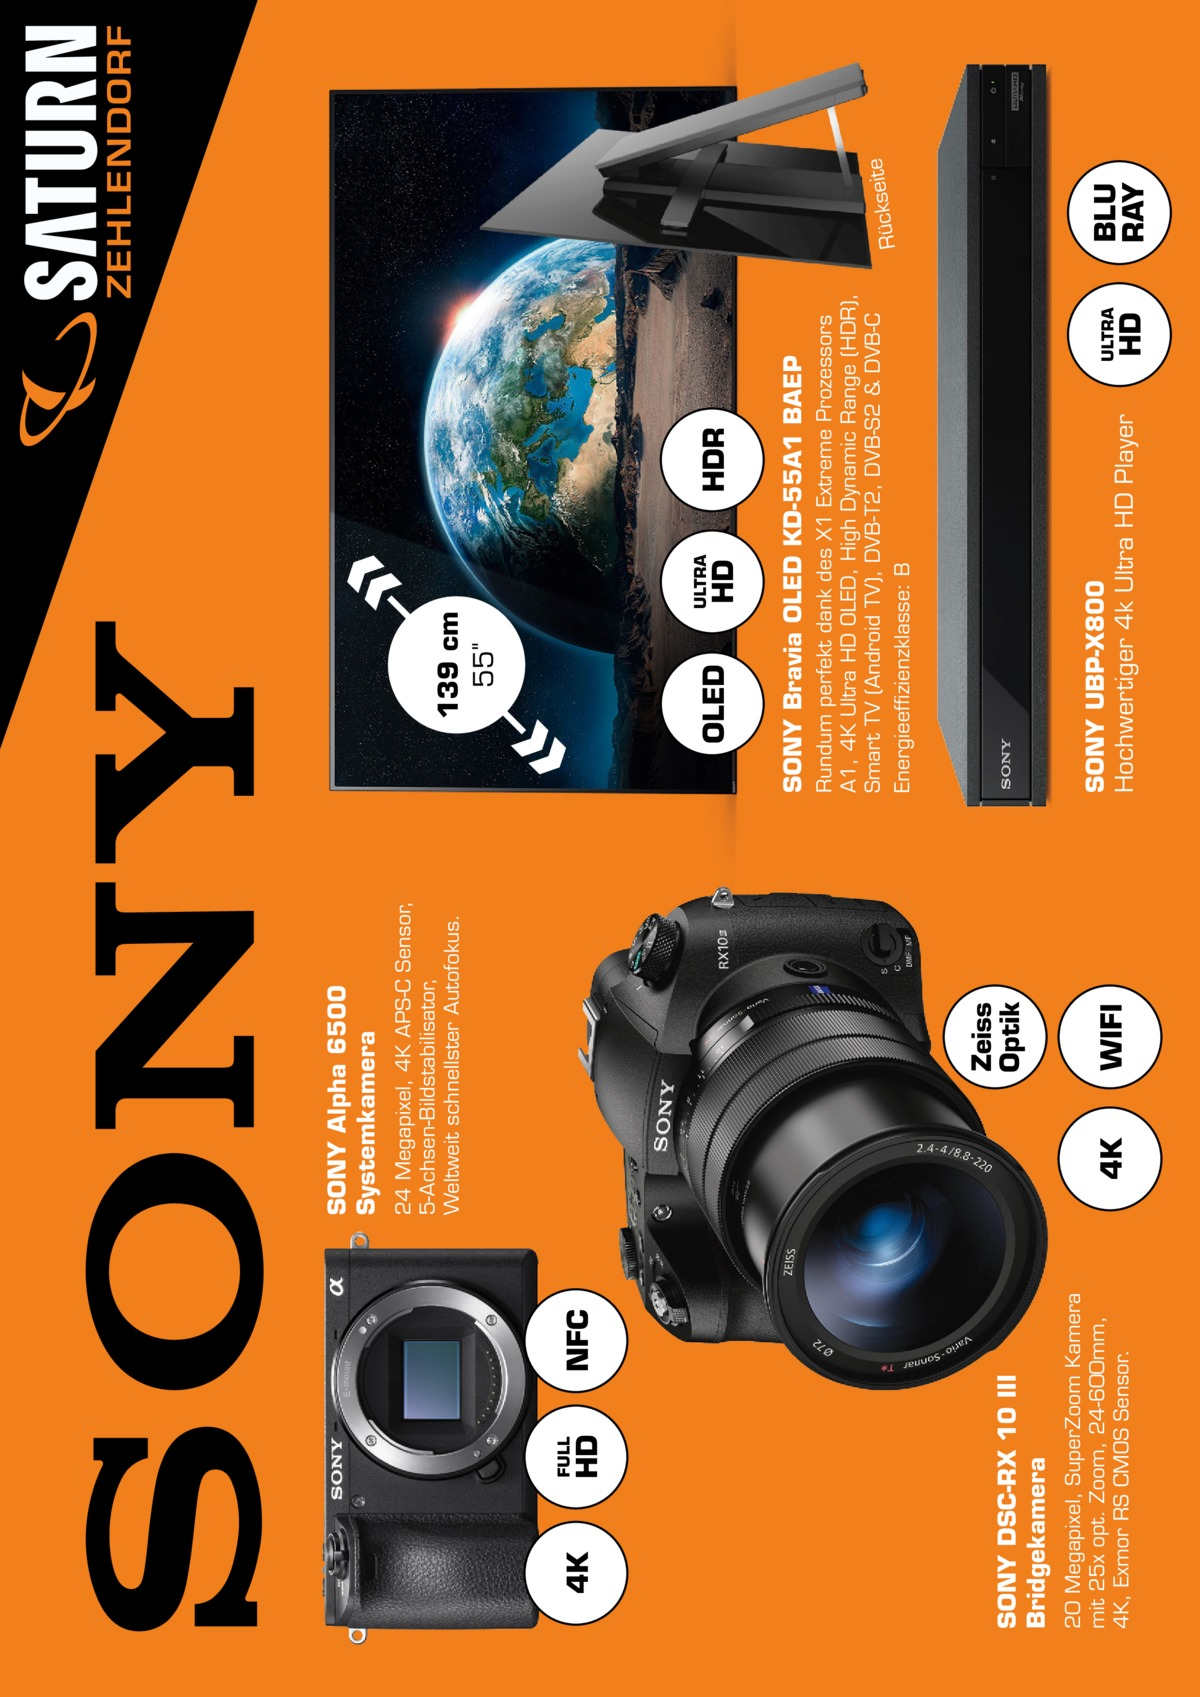 HD  FULL  NFC  20 Megapixel, SuperZoom Kamera mit 25x opt. Zoom, 24-600mm, 4K, Exmor RS CMOS Sensor.  SONY DSCRX RX 10 III Bridgekamera  4K  4K  WIFI  Zeiss Optik  24 Megapixel, 4K APS-C Sensor, 5-Achsen-Bildstabilisator, Weltweit schnellster Autofokus.  SONY Alpha 6500 Systemkamera  HD  ULTRA  HDR  SONY UBPX800 Hochwertiger 4k Ultra HD Player  HD  ULTRA  Rundum perfekt dank des X1 Extreme Prozessors A1, 4K Ultra HD OLED, High Dynamic Range (HDR), Smart TV (Android TV), DVB-T2, DVB-S2 & DVB-C Energieeffizienzklasse: B  SONY Bravia OLED KD55A1 BAEP  OLED  139cm 55  BLU RAY  ite Rückse  ZEHLENDORF